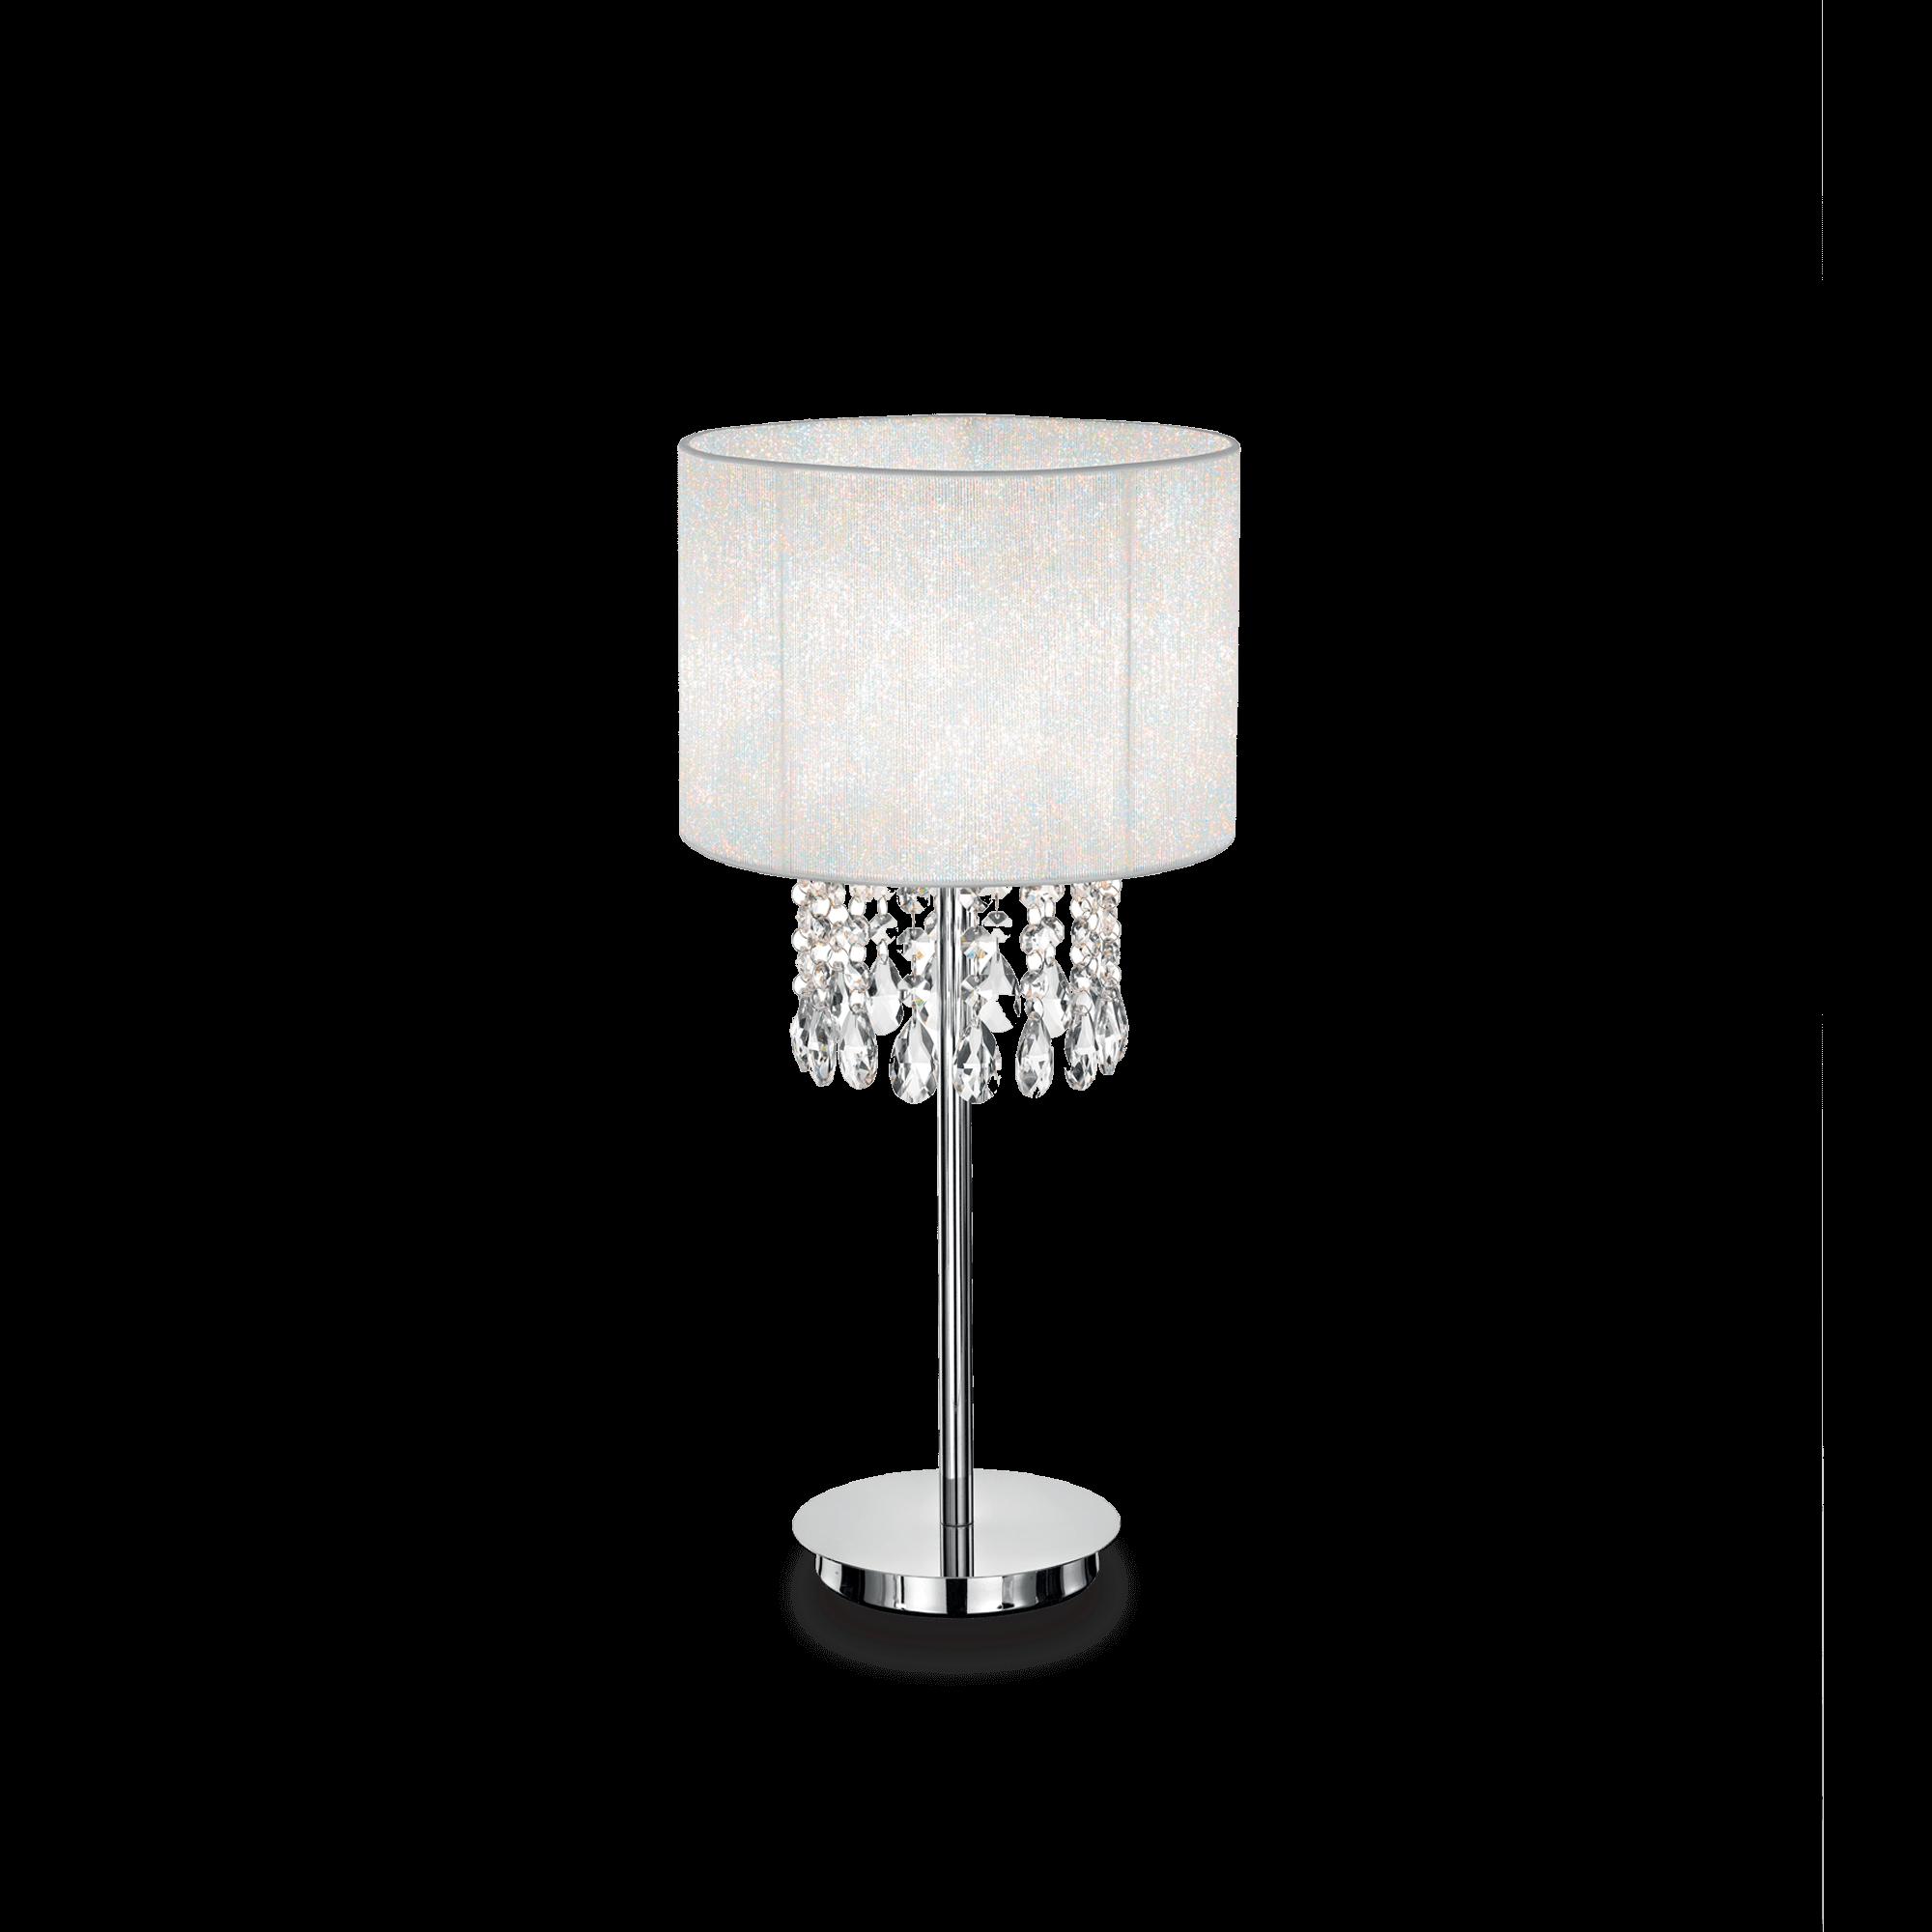 Ideal Lux Mod Opera Tl1 Bianco Lampada Da Tavolo 1 Luce Ebay